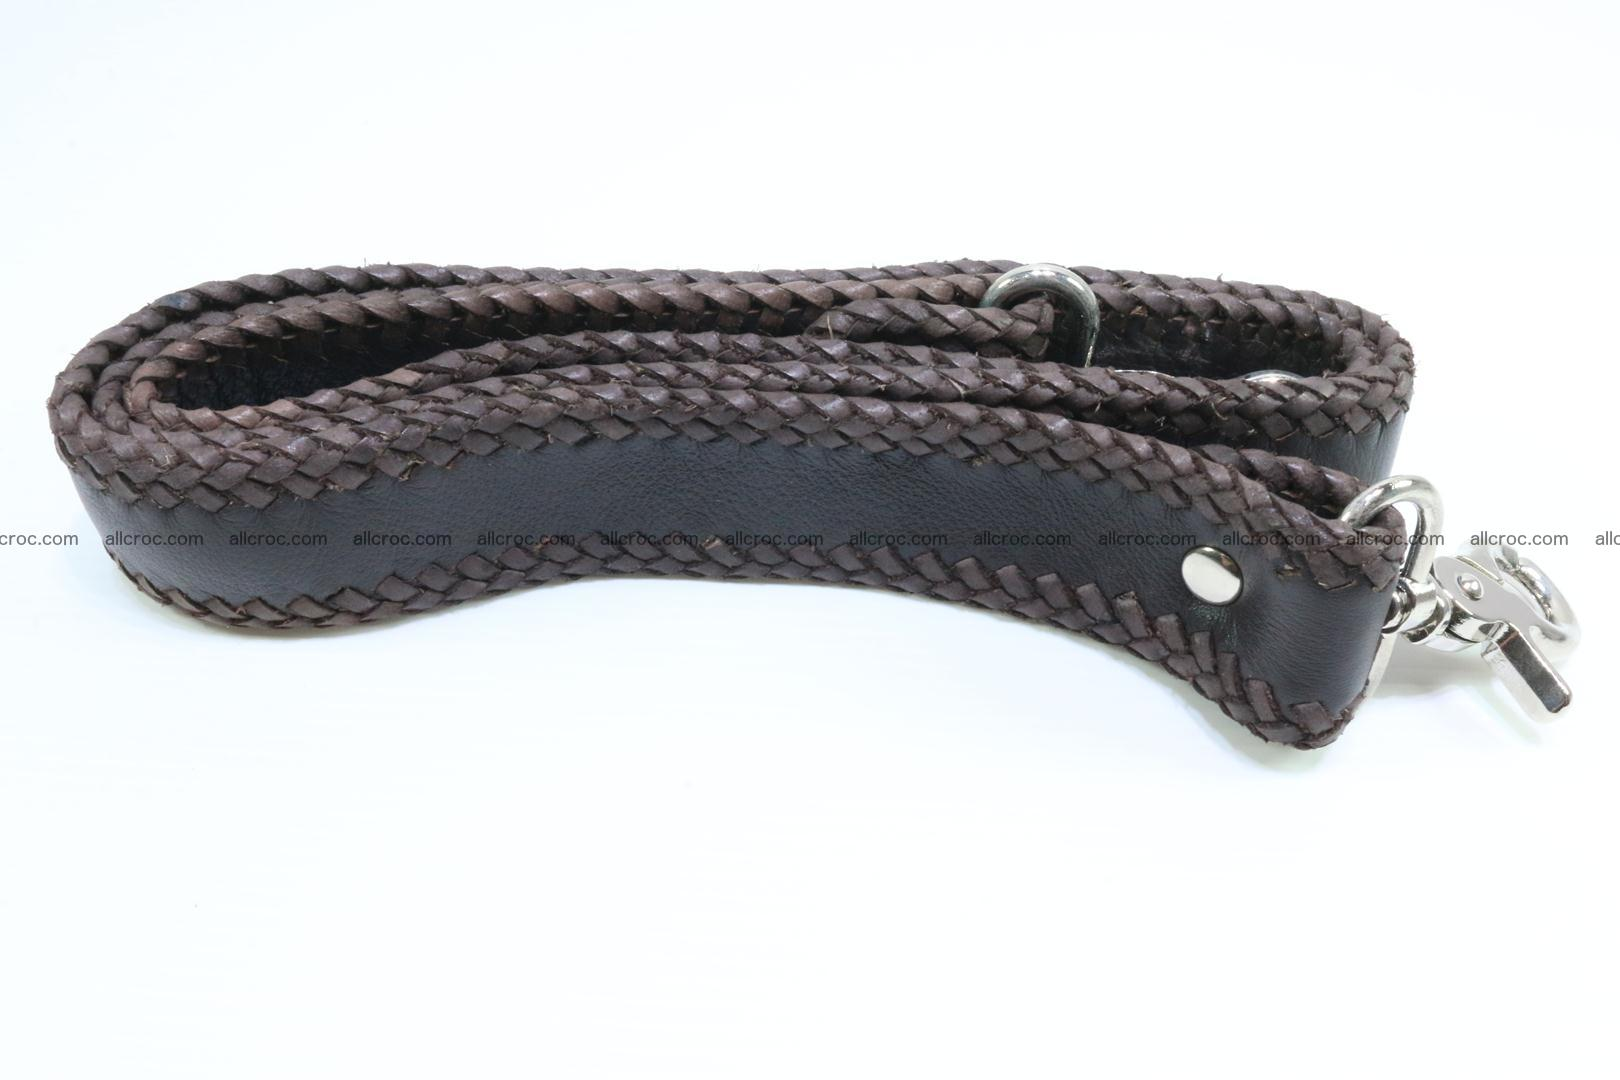 Crocodile skin messenger bag braided edges 138 Foto 10